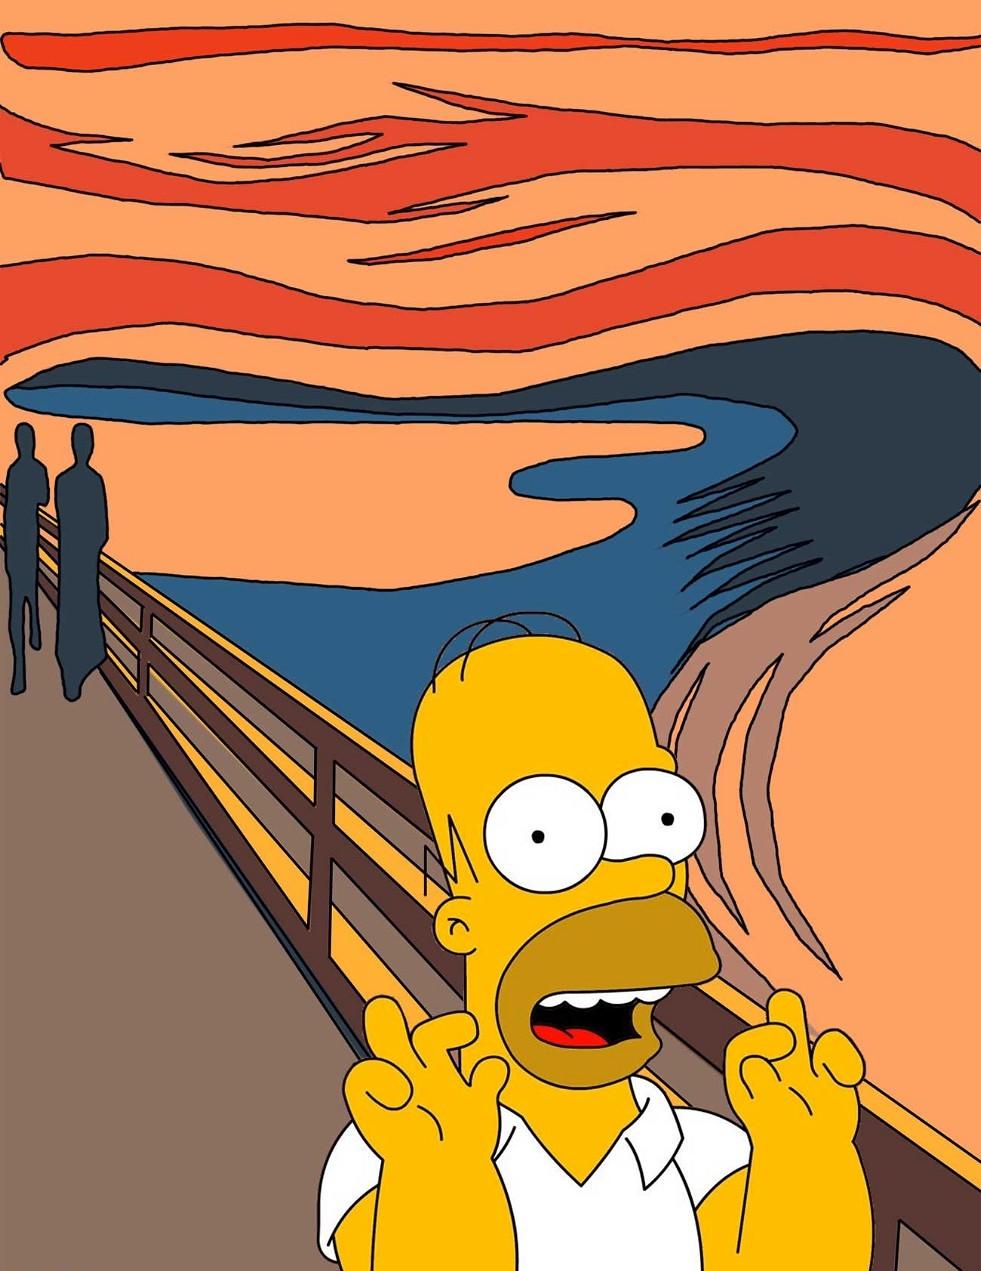 Screaming-Homer-Simpson-Painting-93190